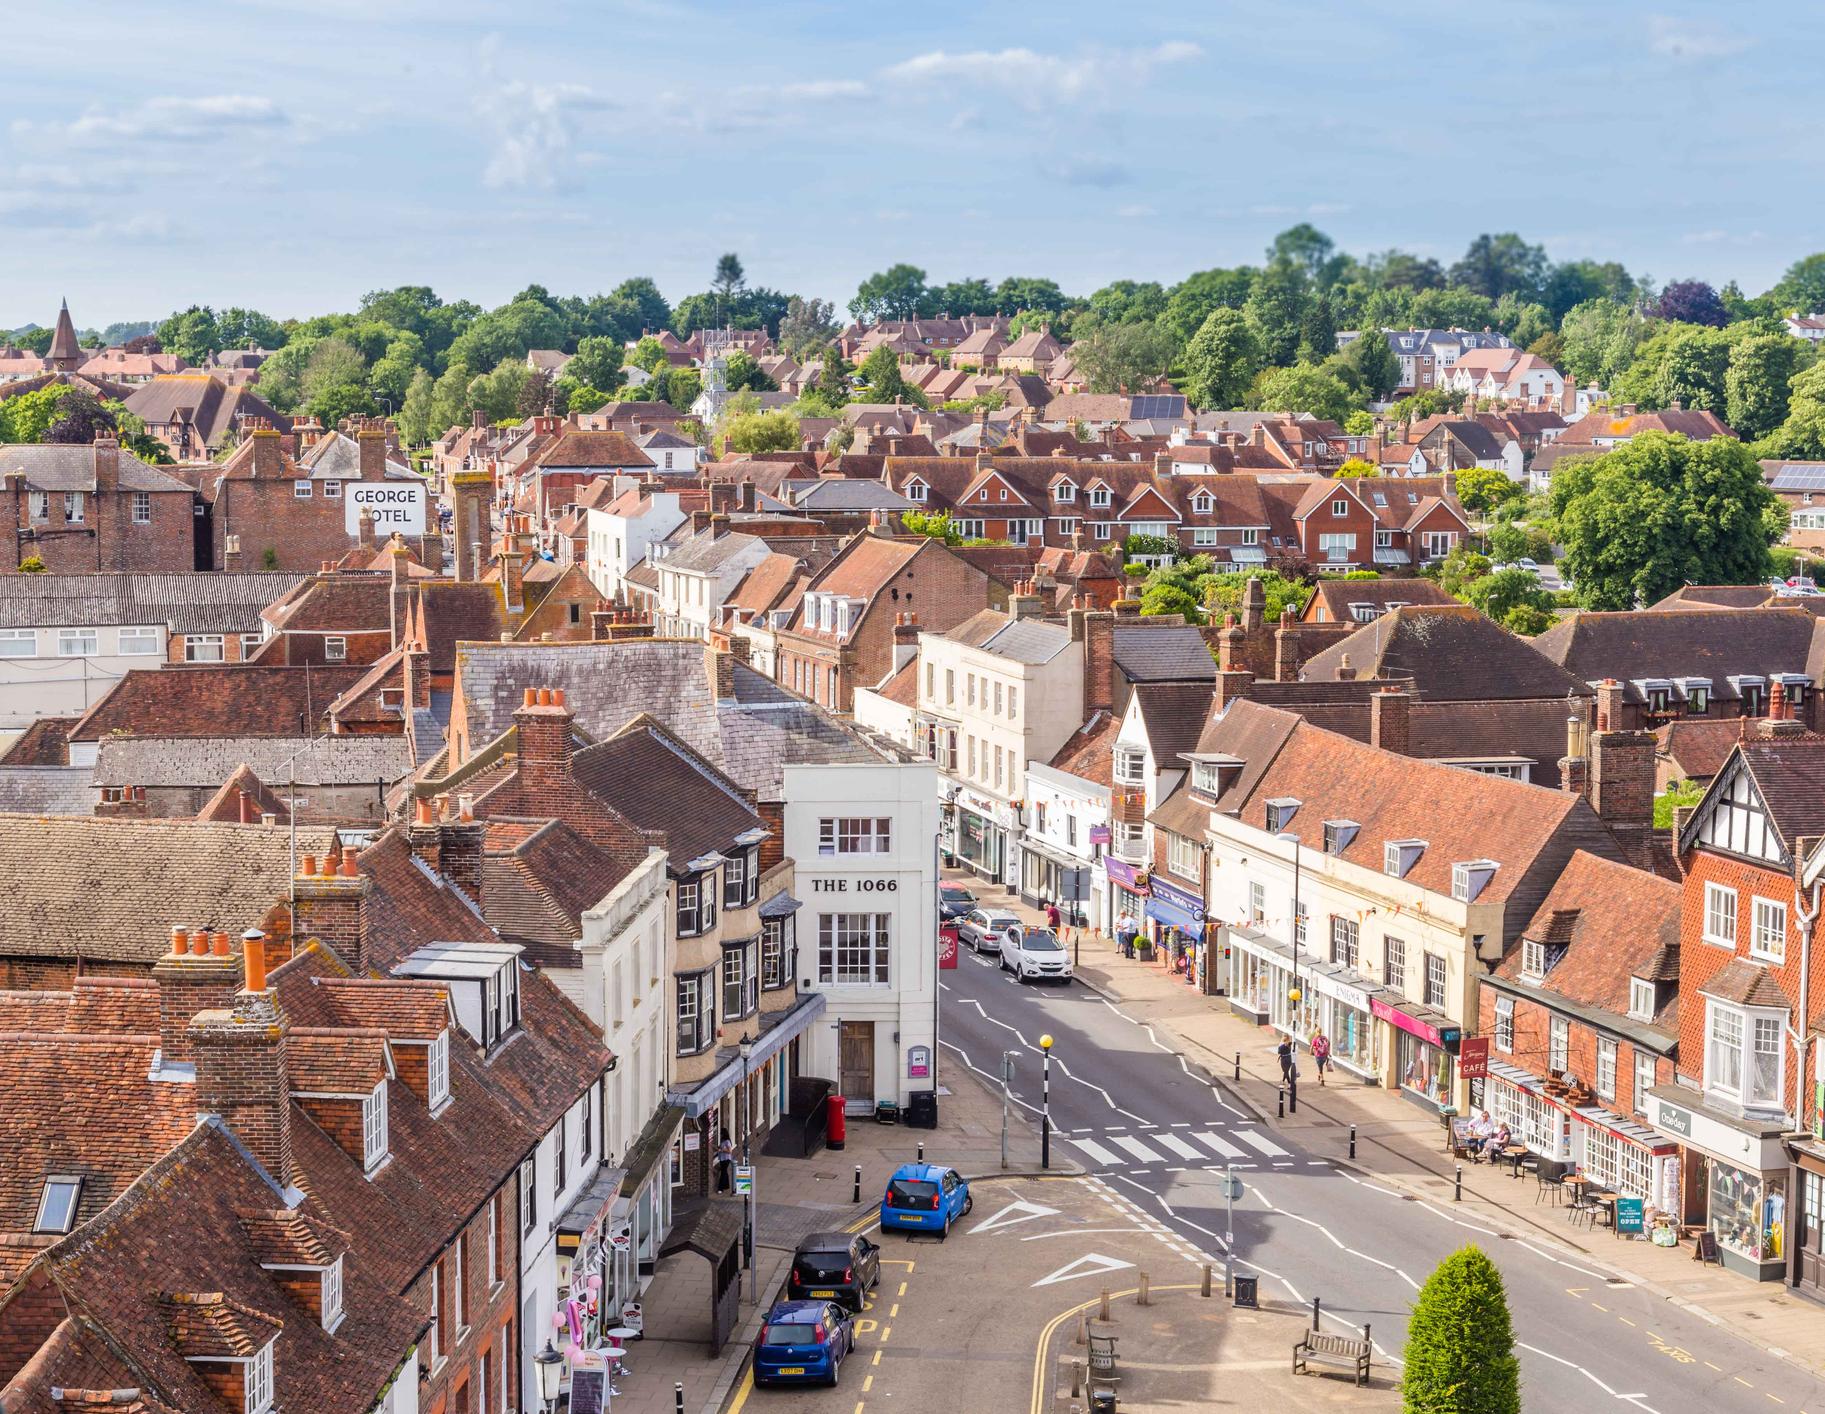 Battle, Sussex, UK - June, 03, 2017: City scape of Batte in Sussex, UK